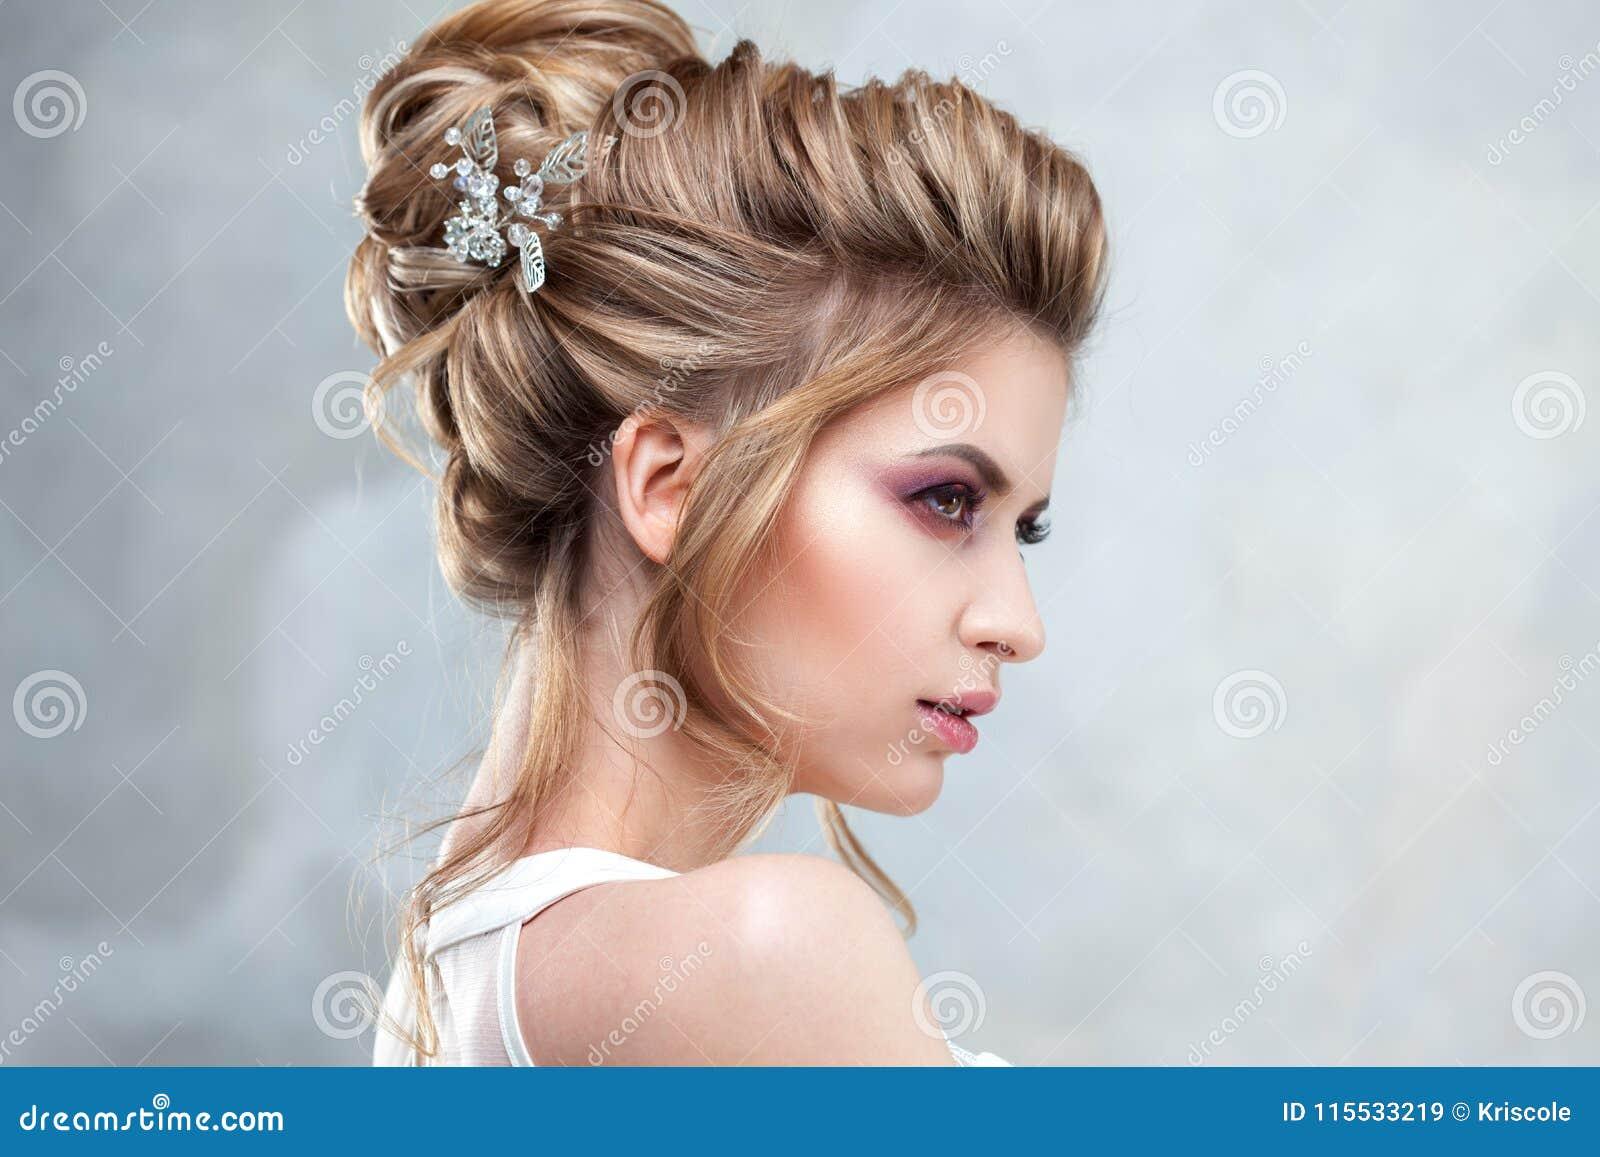 Young Beautiful Bride With An Elegant High Hairdo. Wedding